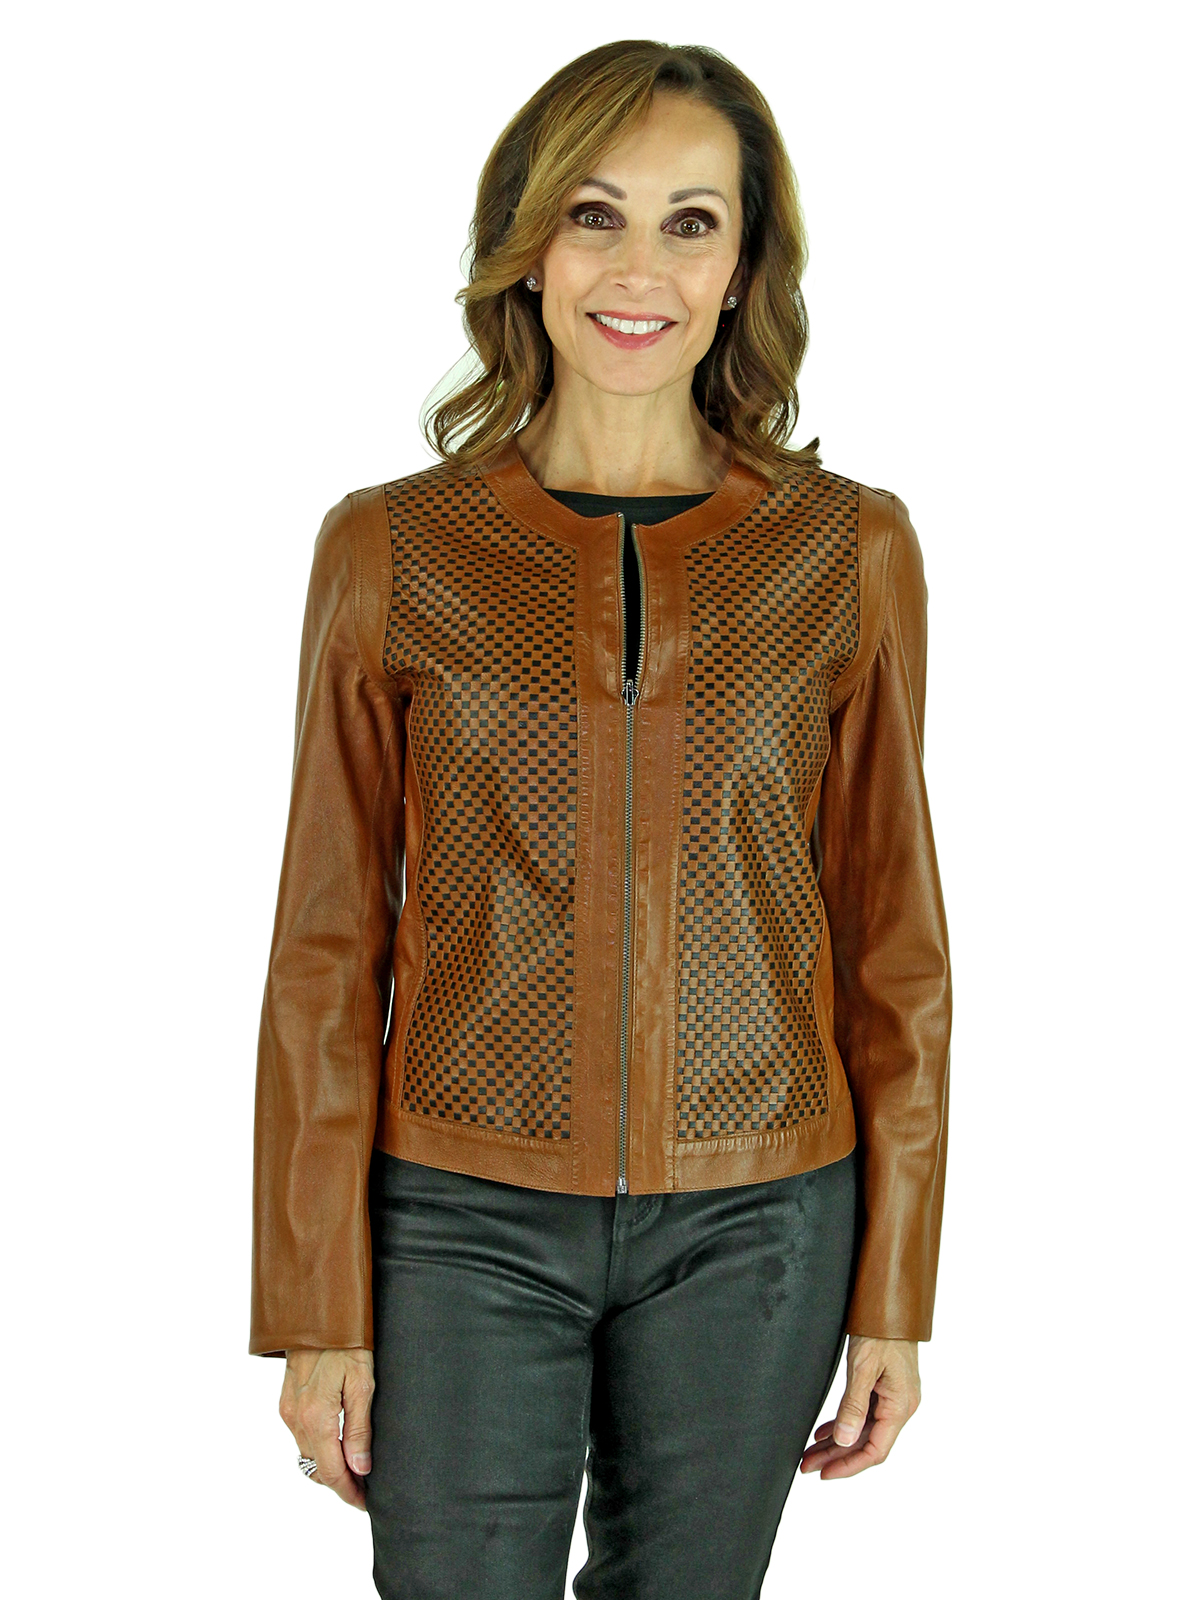 Woman's Black and Cognac Leather Reversible Zipper Jacket